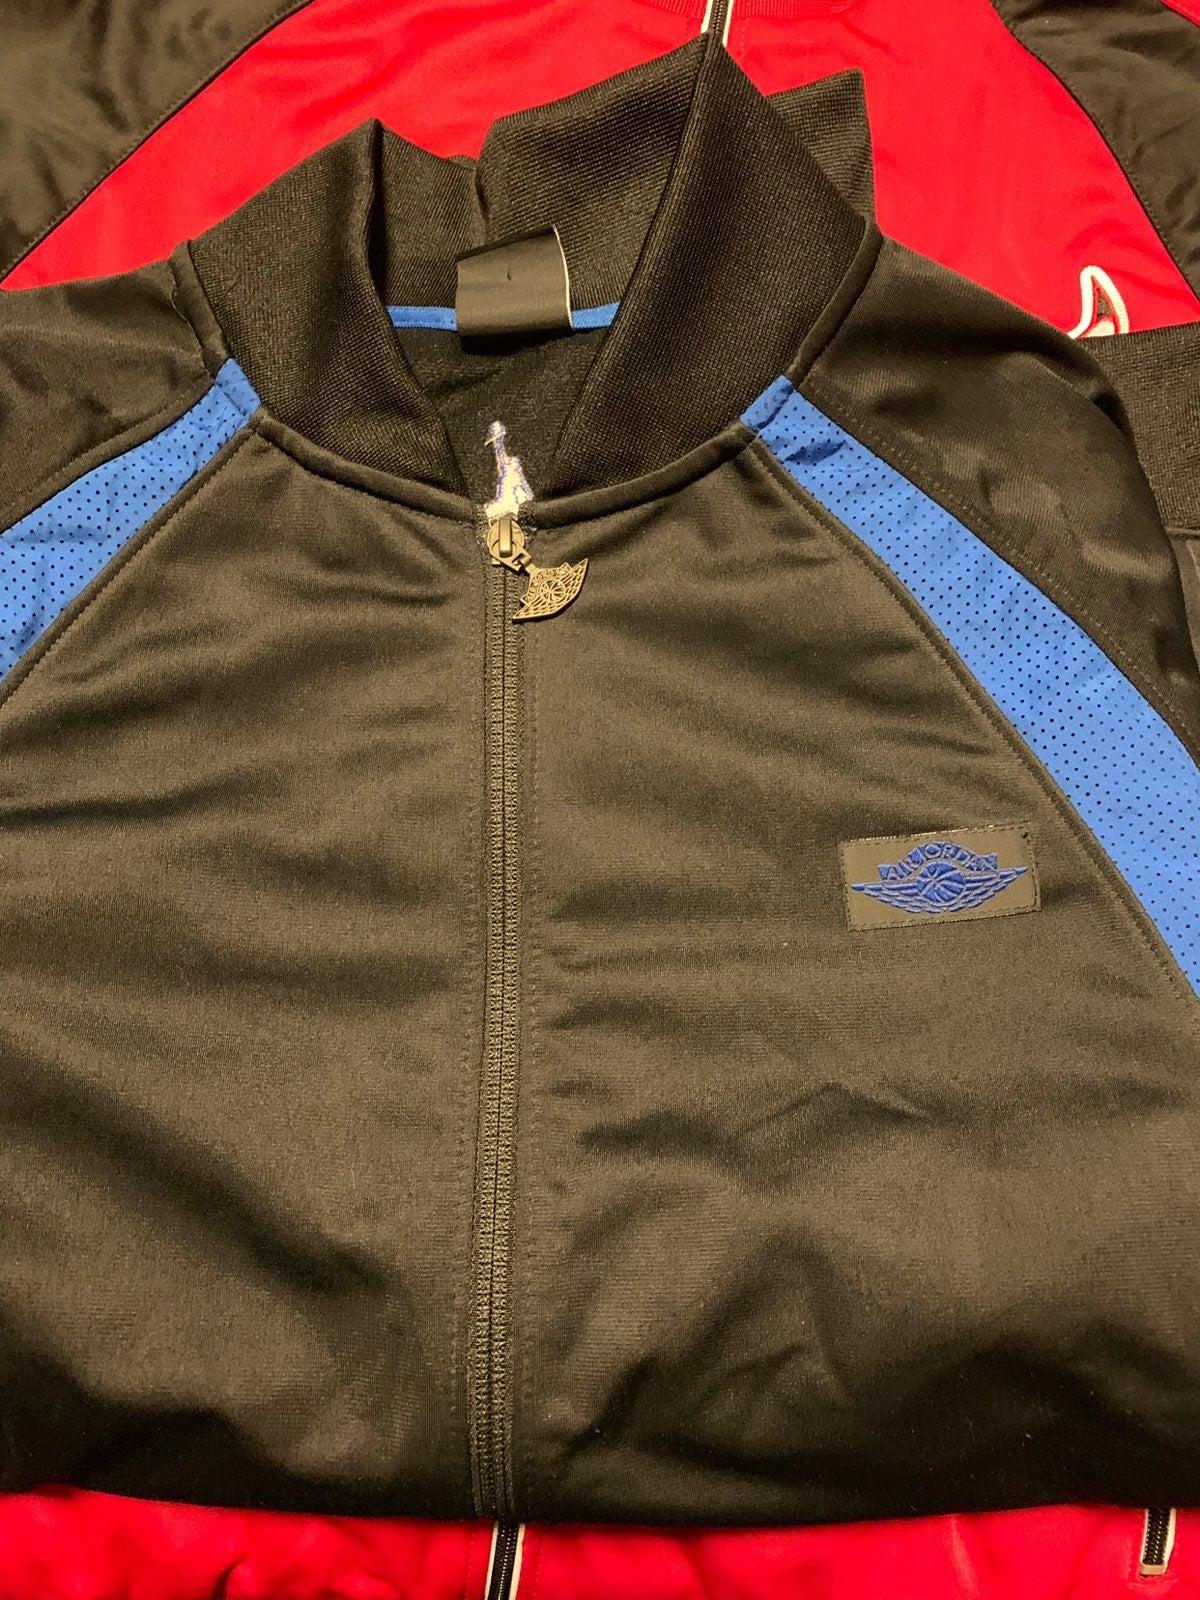 Air Jordan One Track Jacket